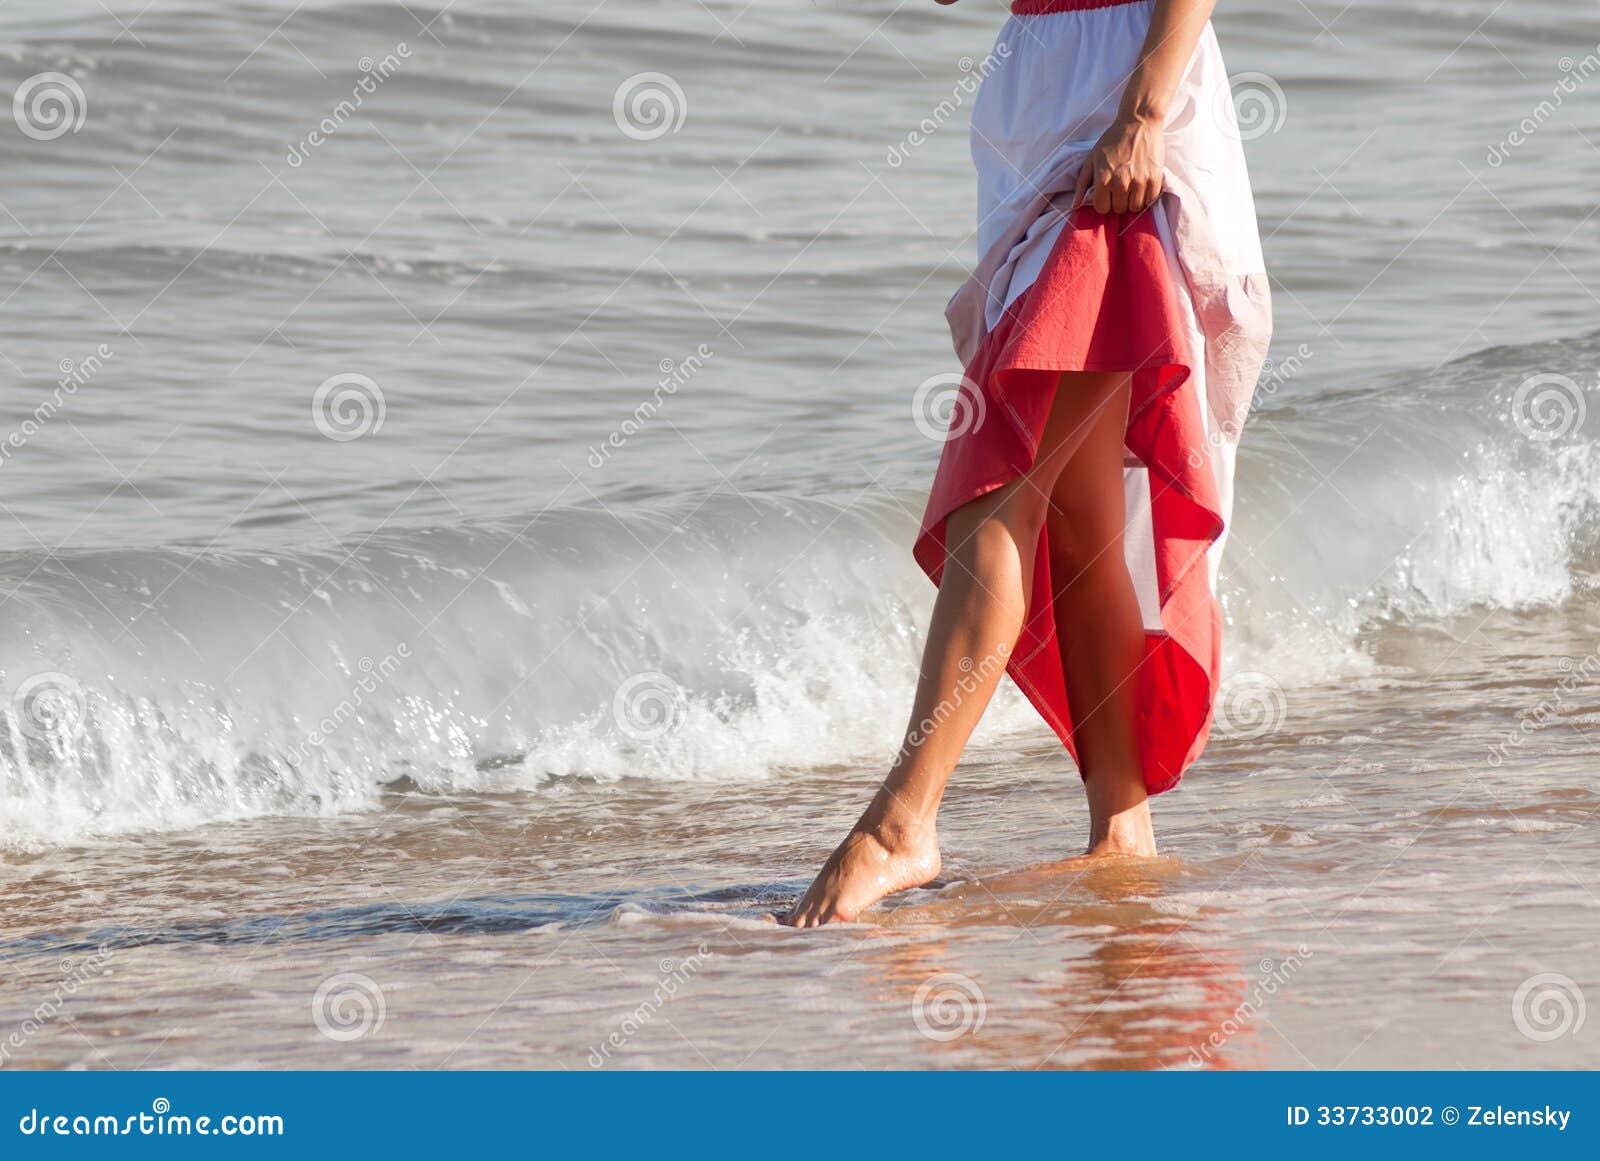 Alone woman walking on the beach